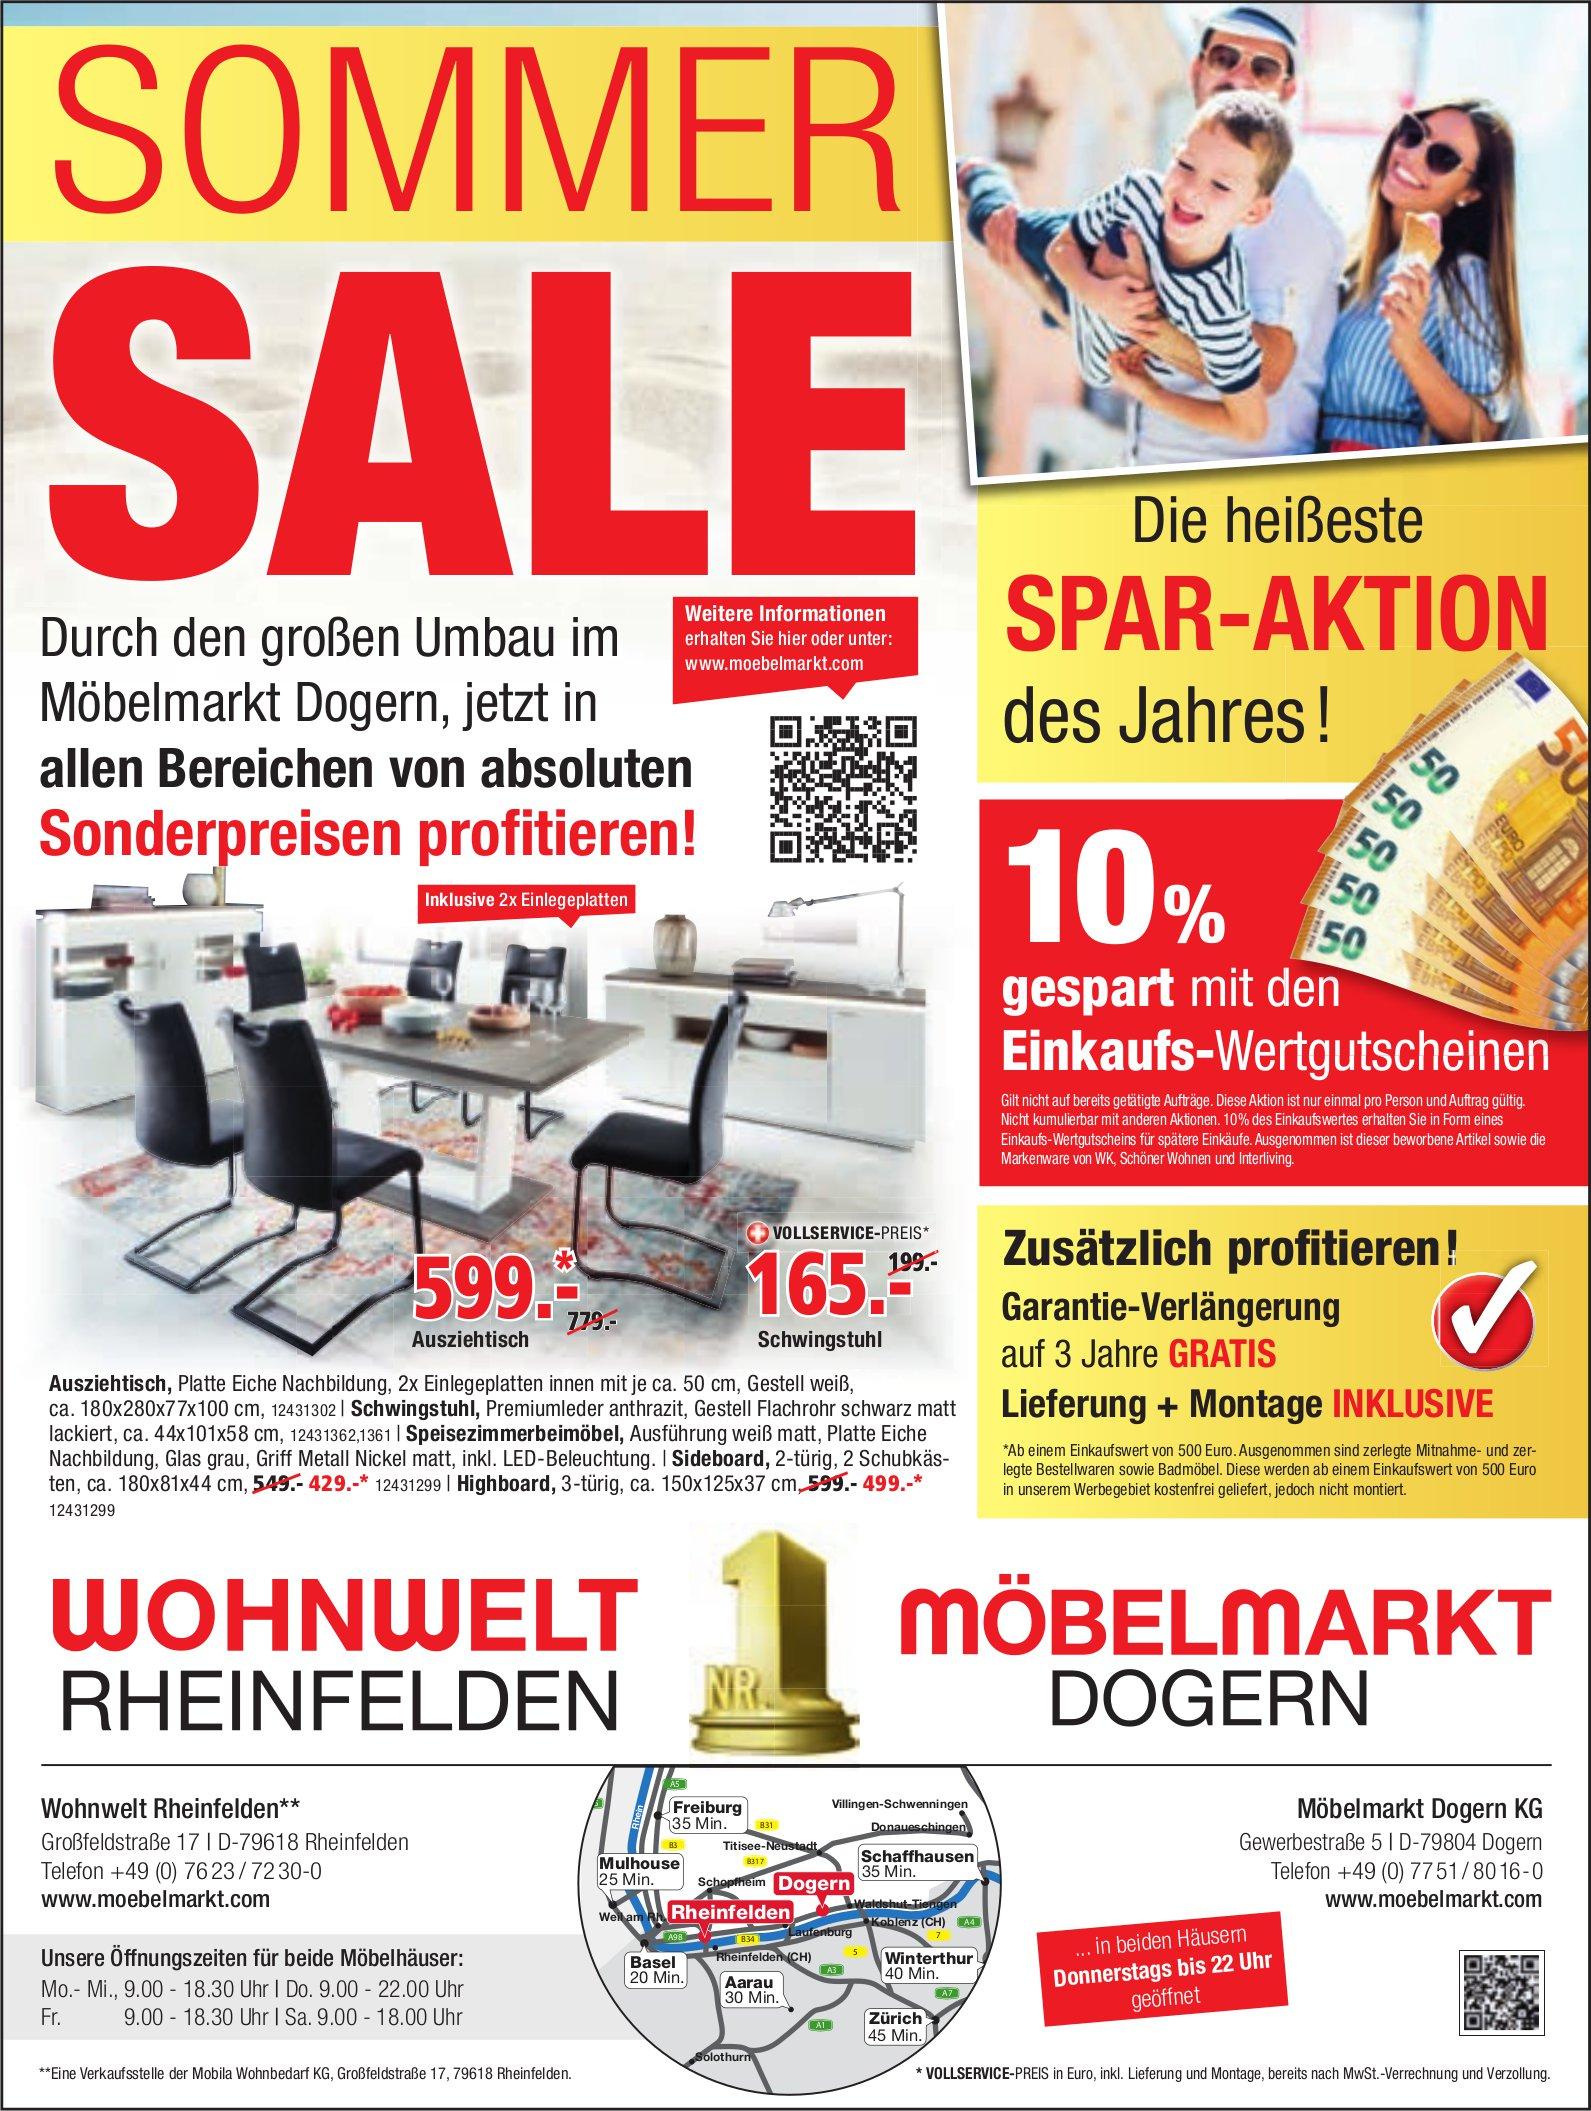 Wohnwelt, D-Rheinfelden - Sommer Sale